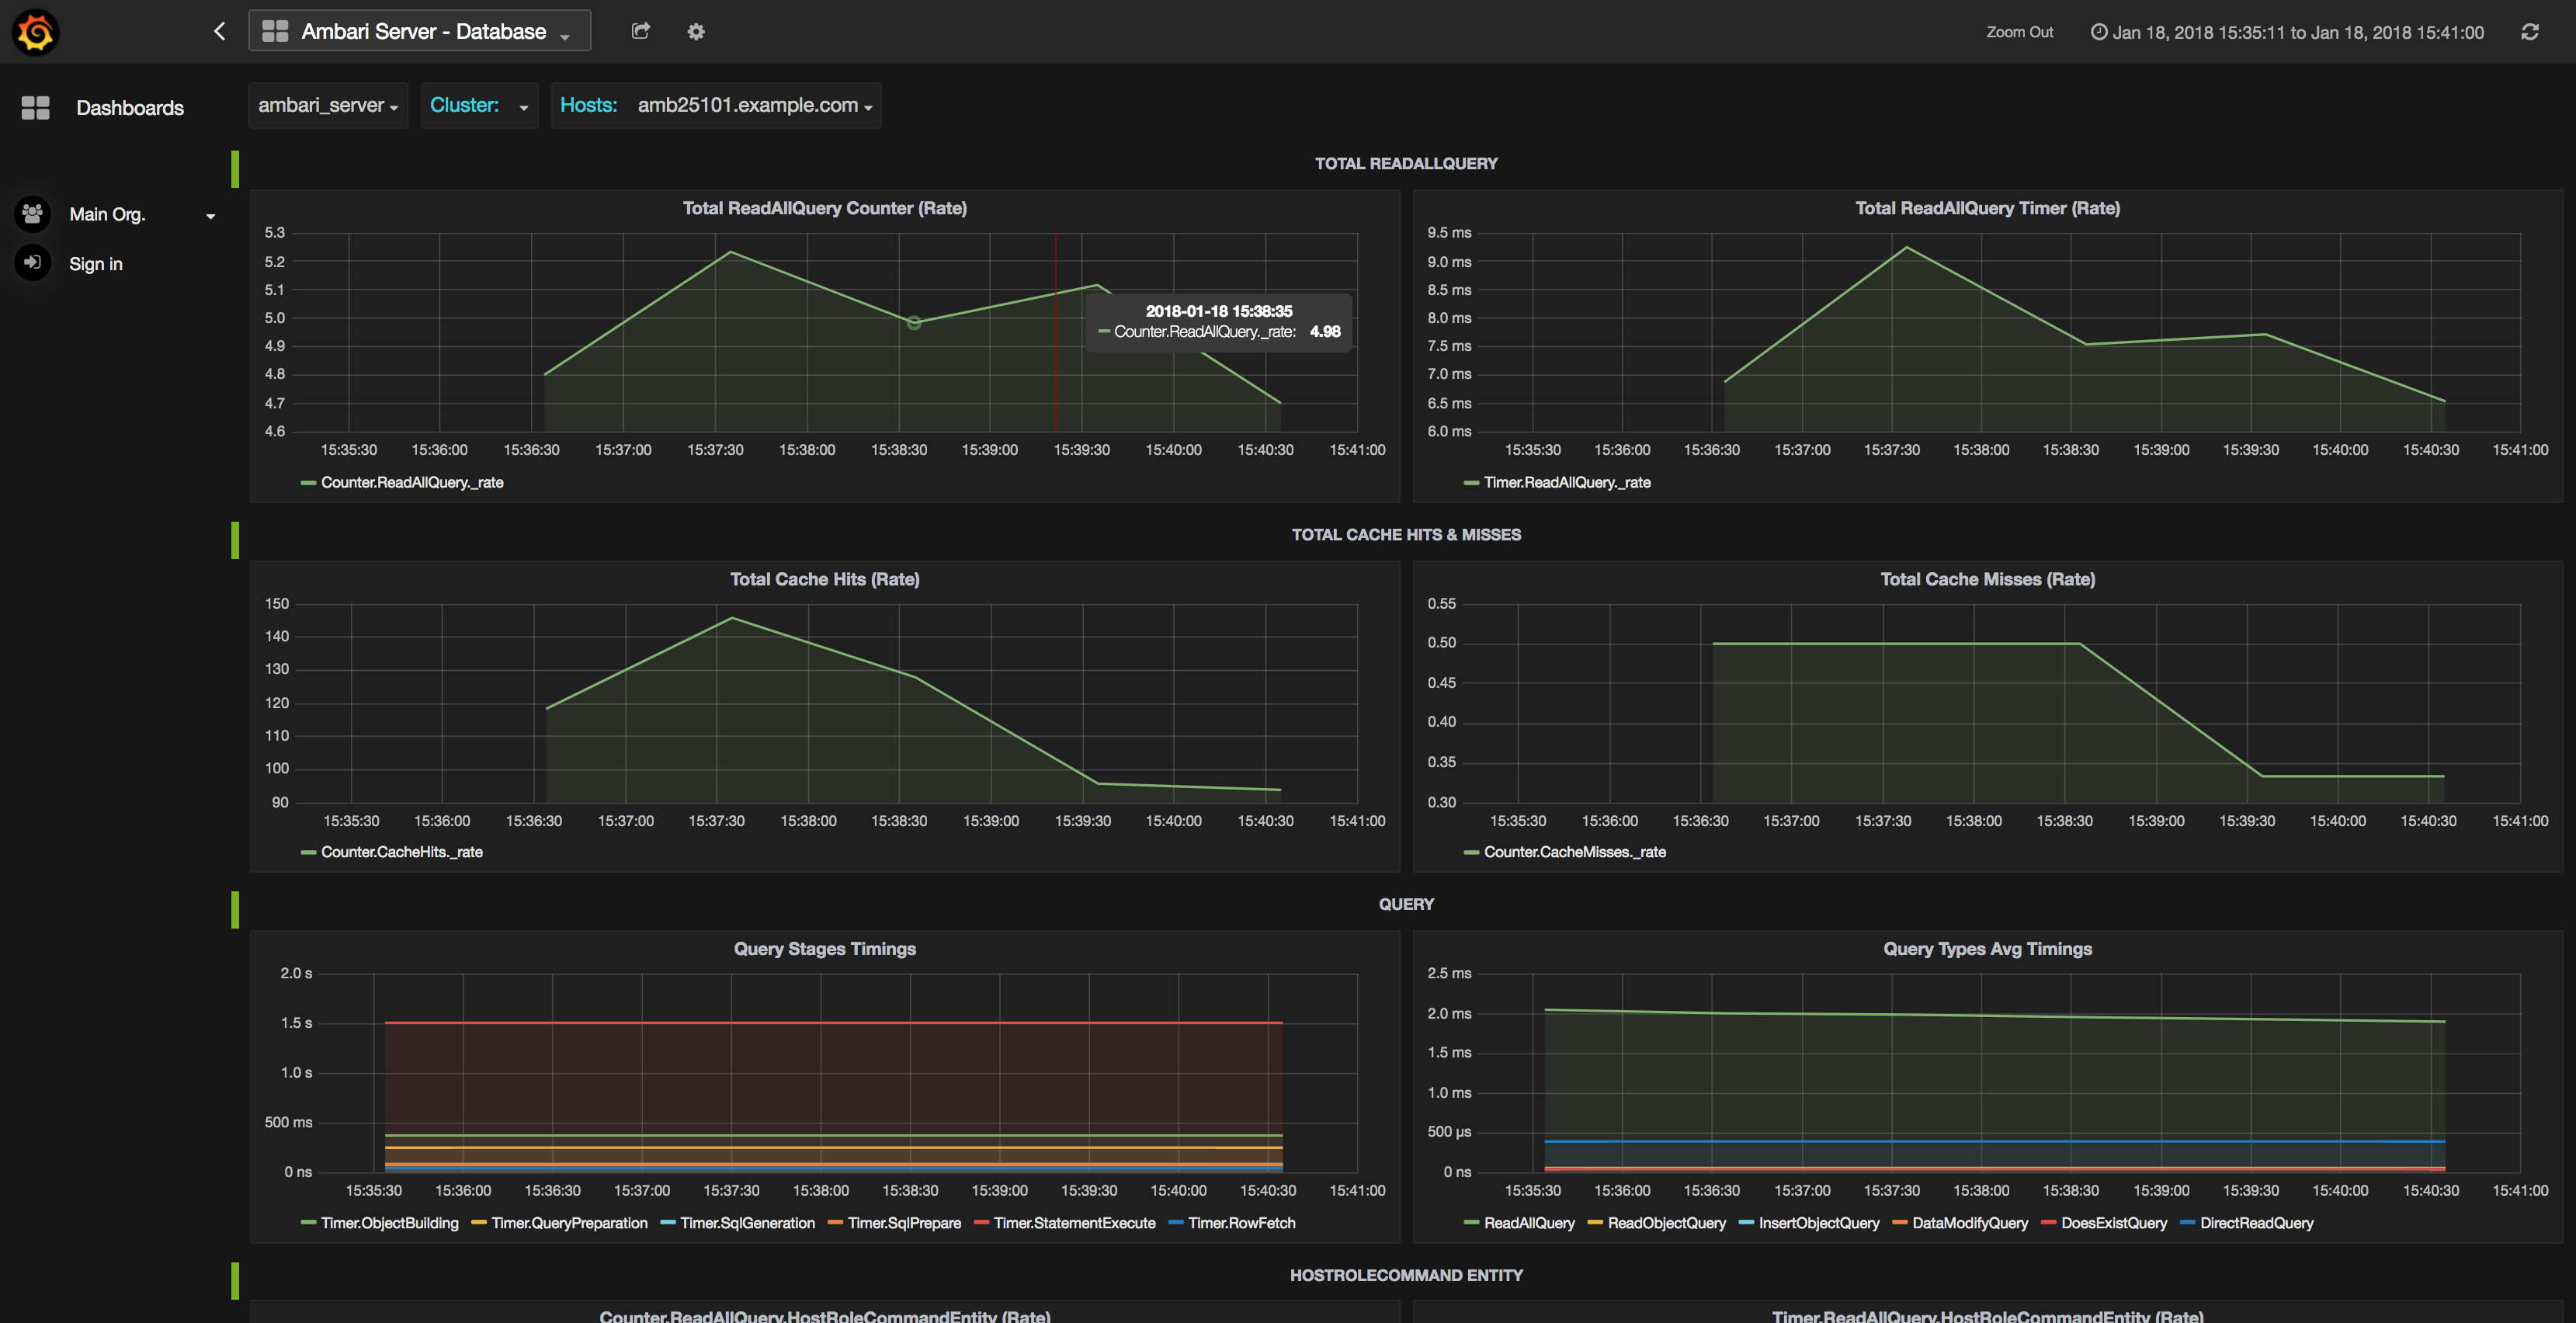 Ambari Server Performance Tuning & Troubleshooting